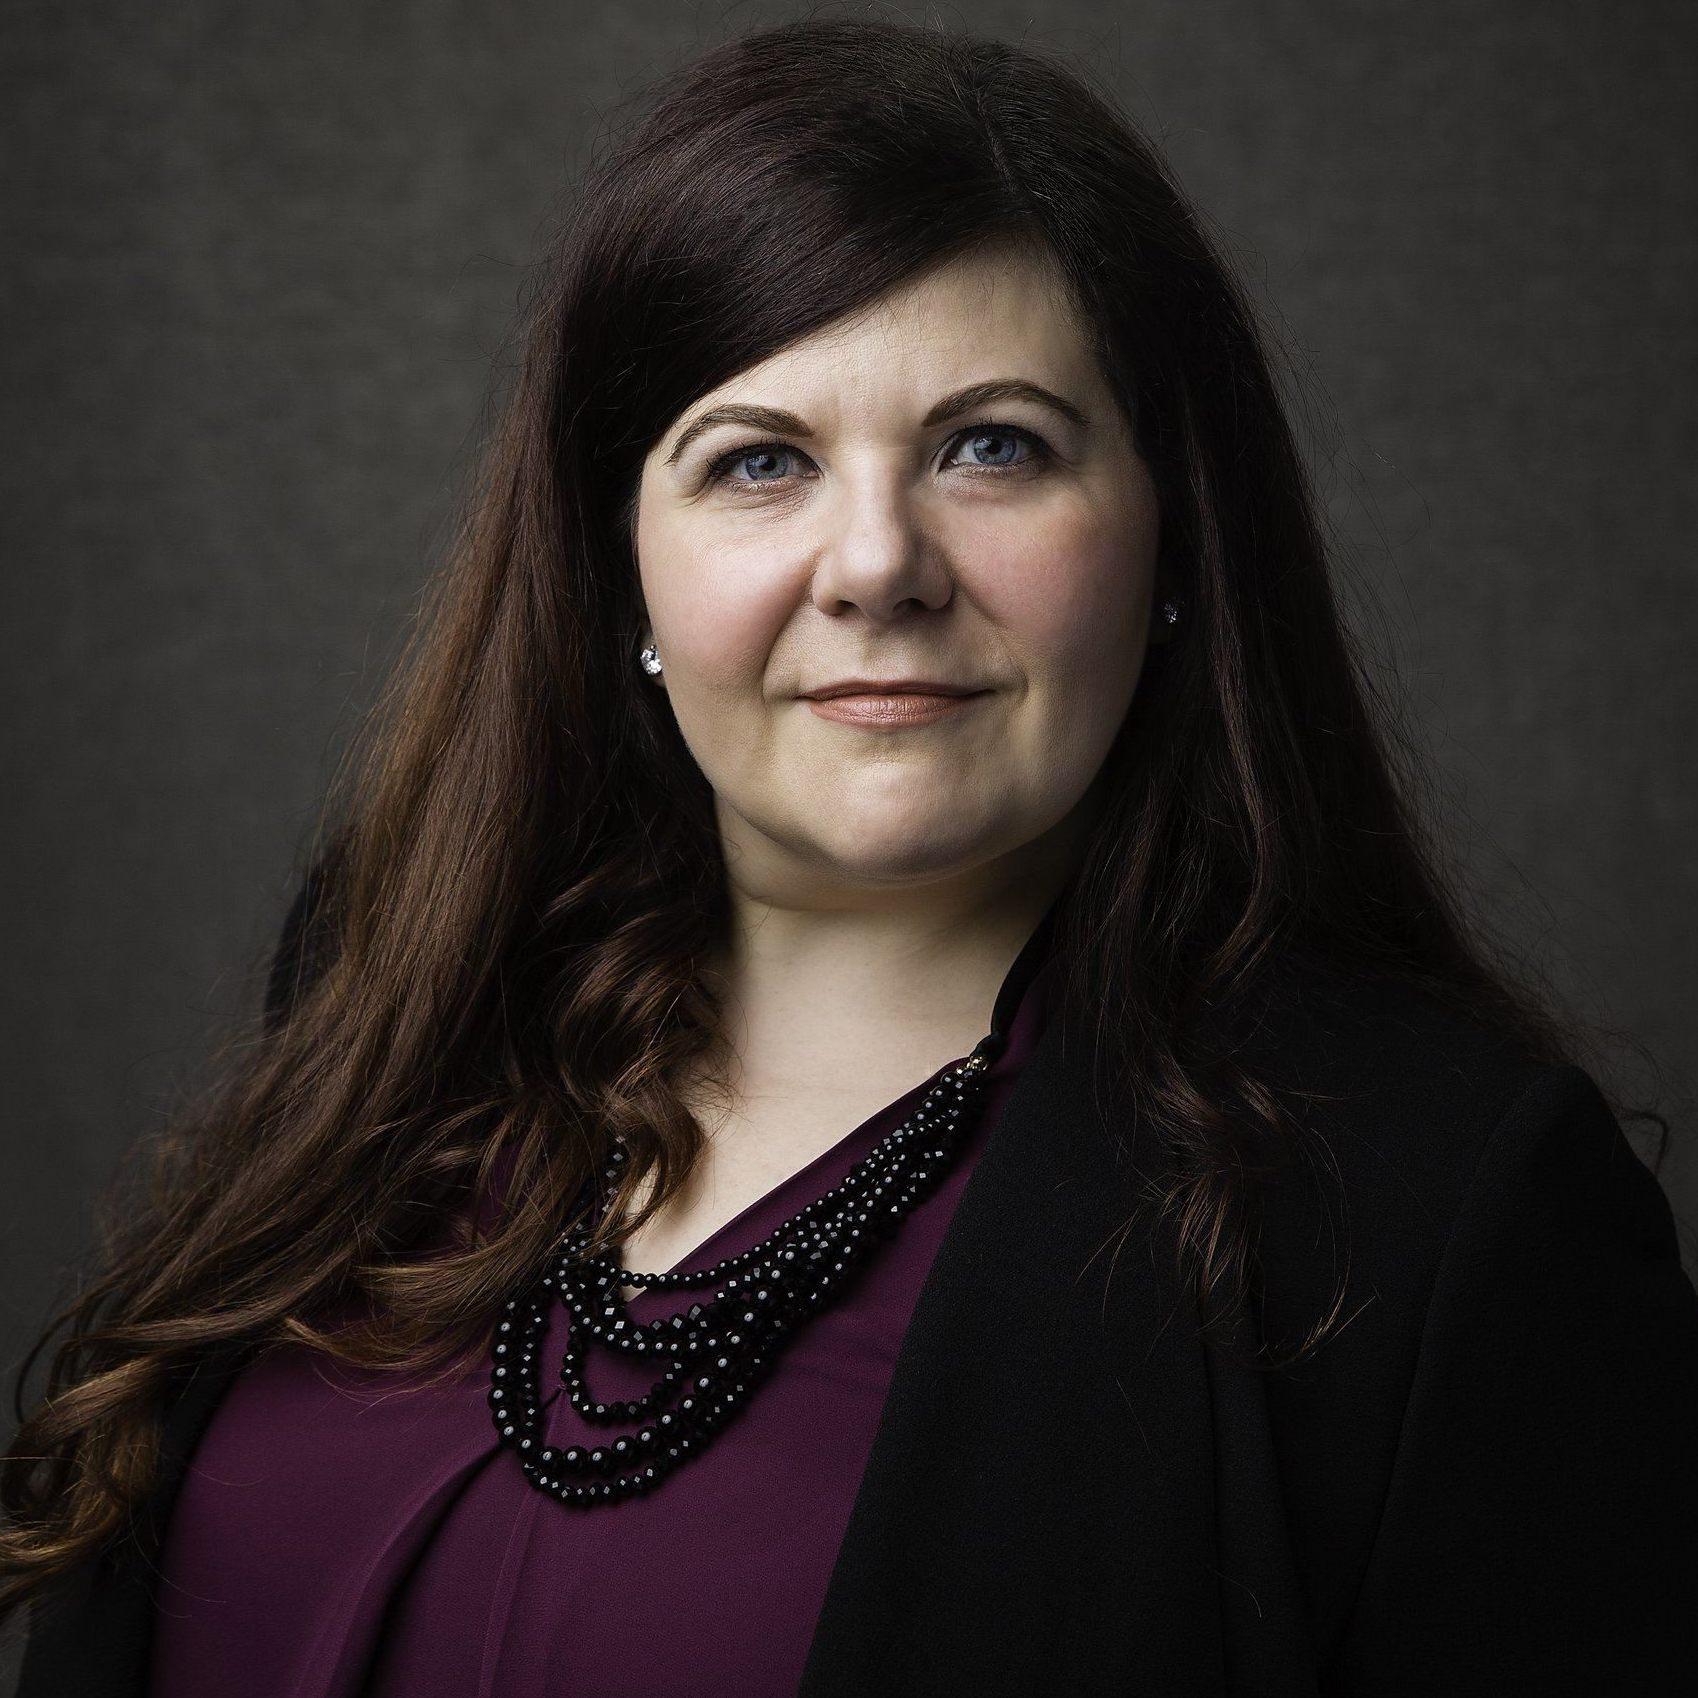 Caroline Riseboro - Chief Executive Officer at Plan International Canada